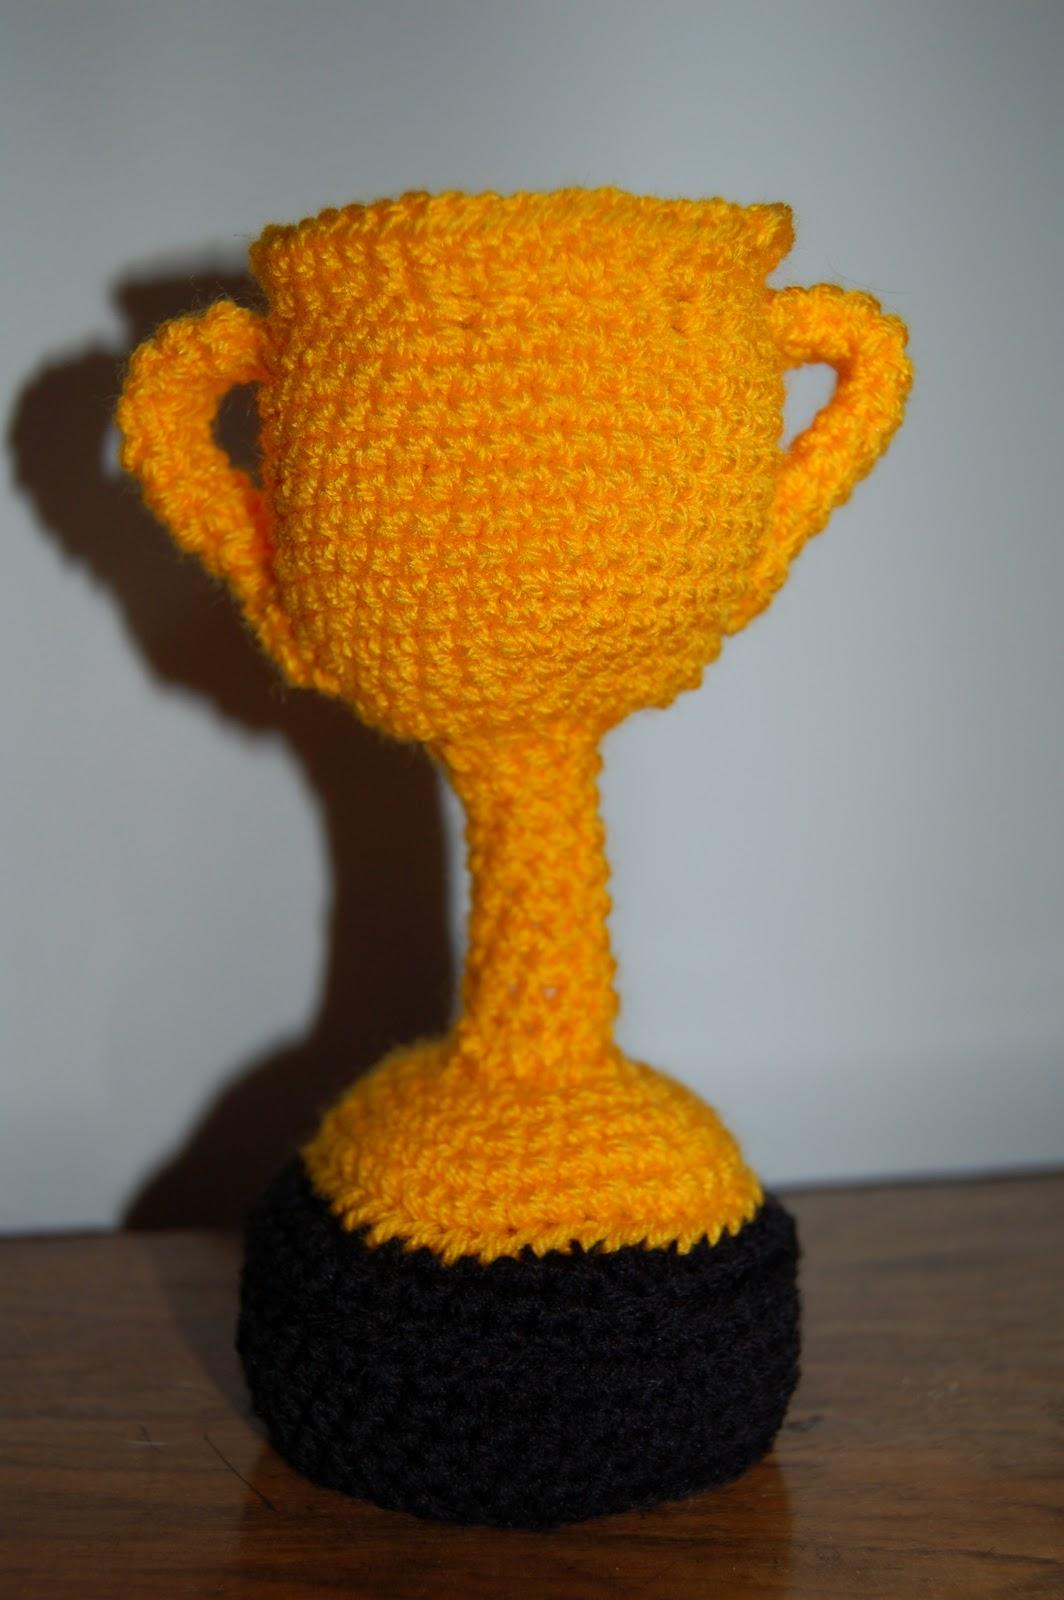 Easy Crochet Mittens Free Pattern | AllFreeCrochet.com